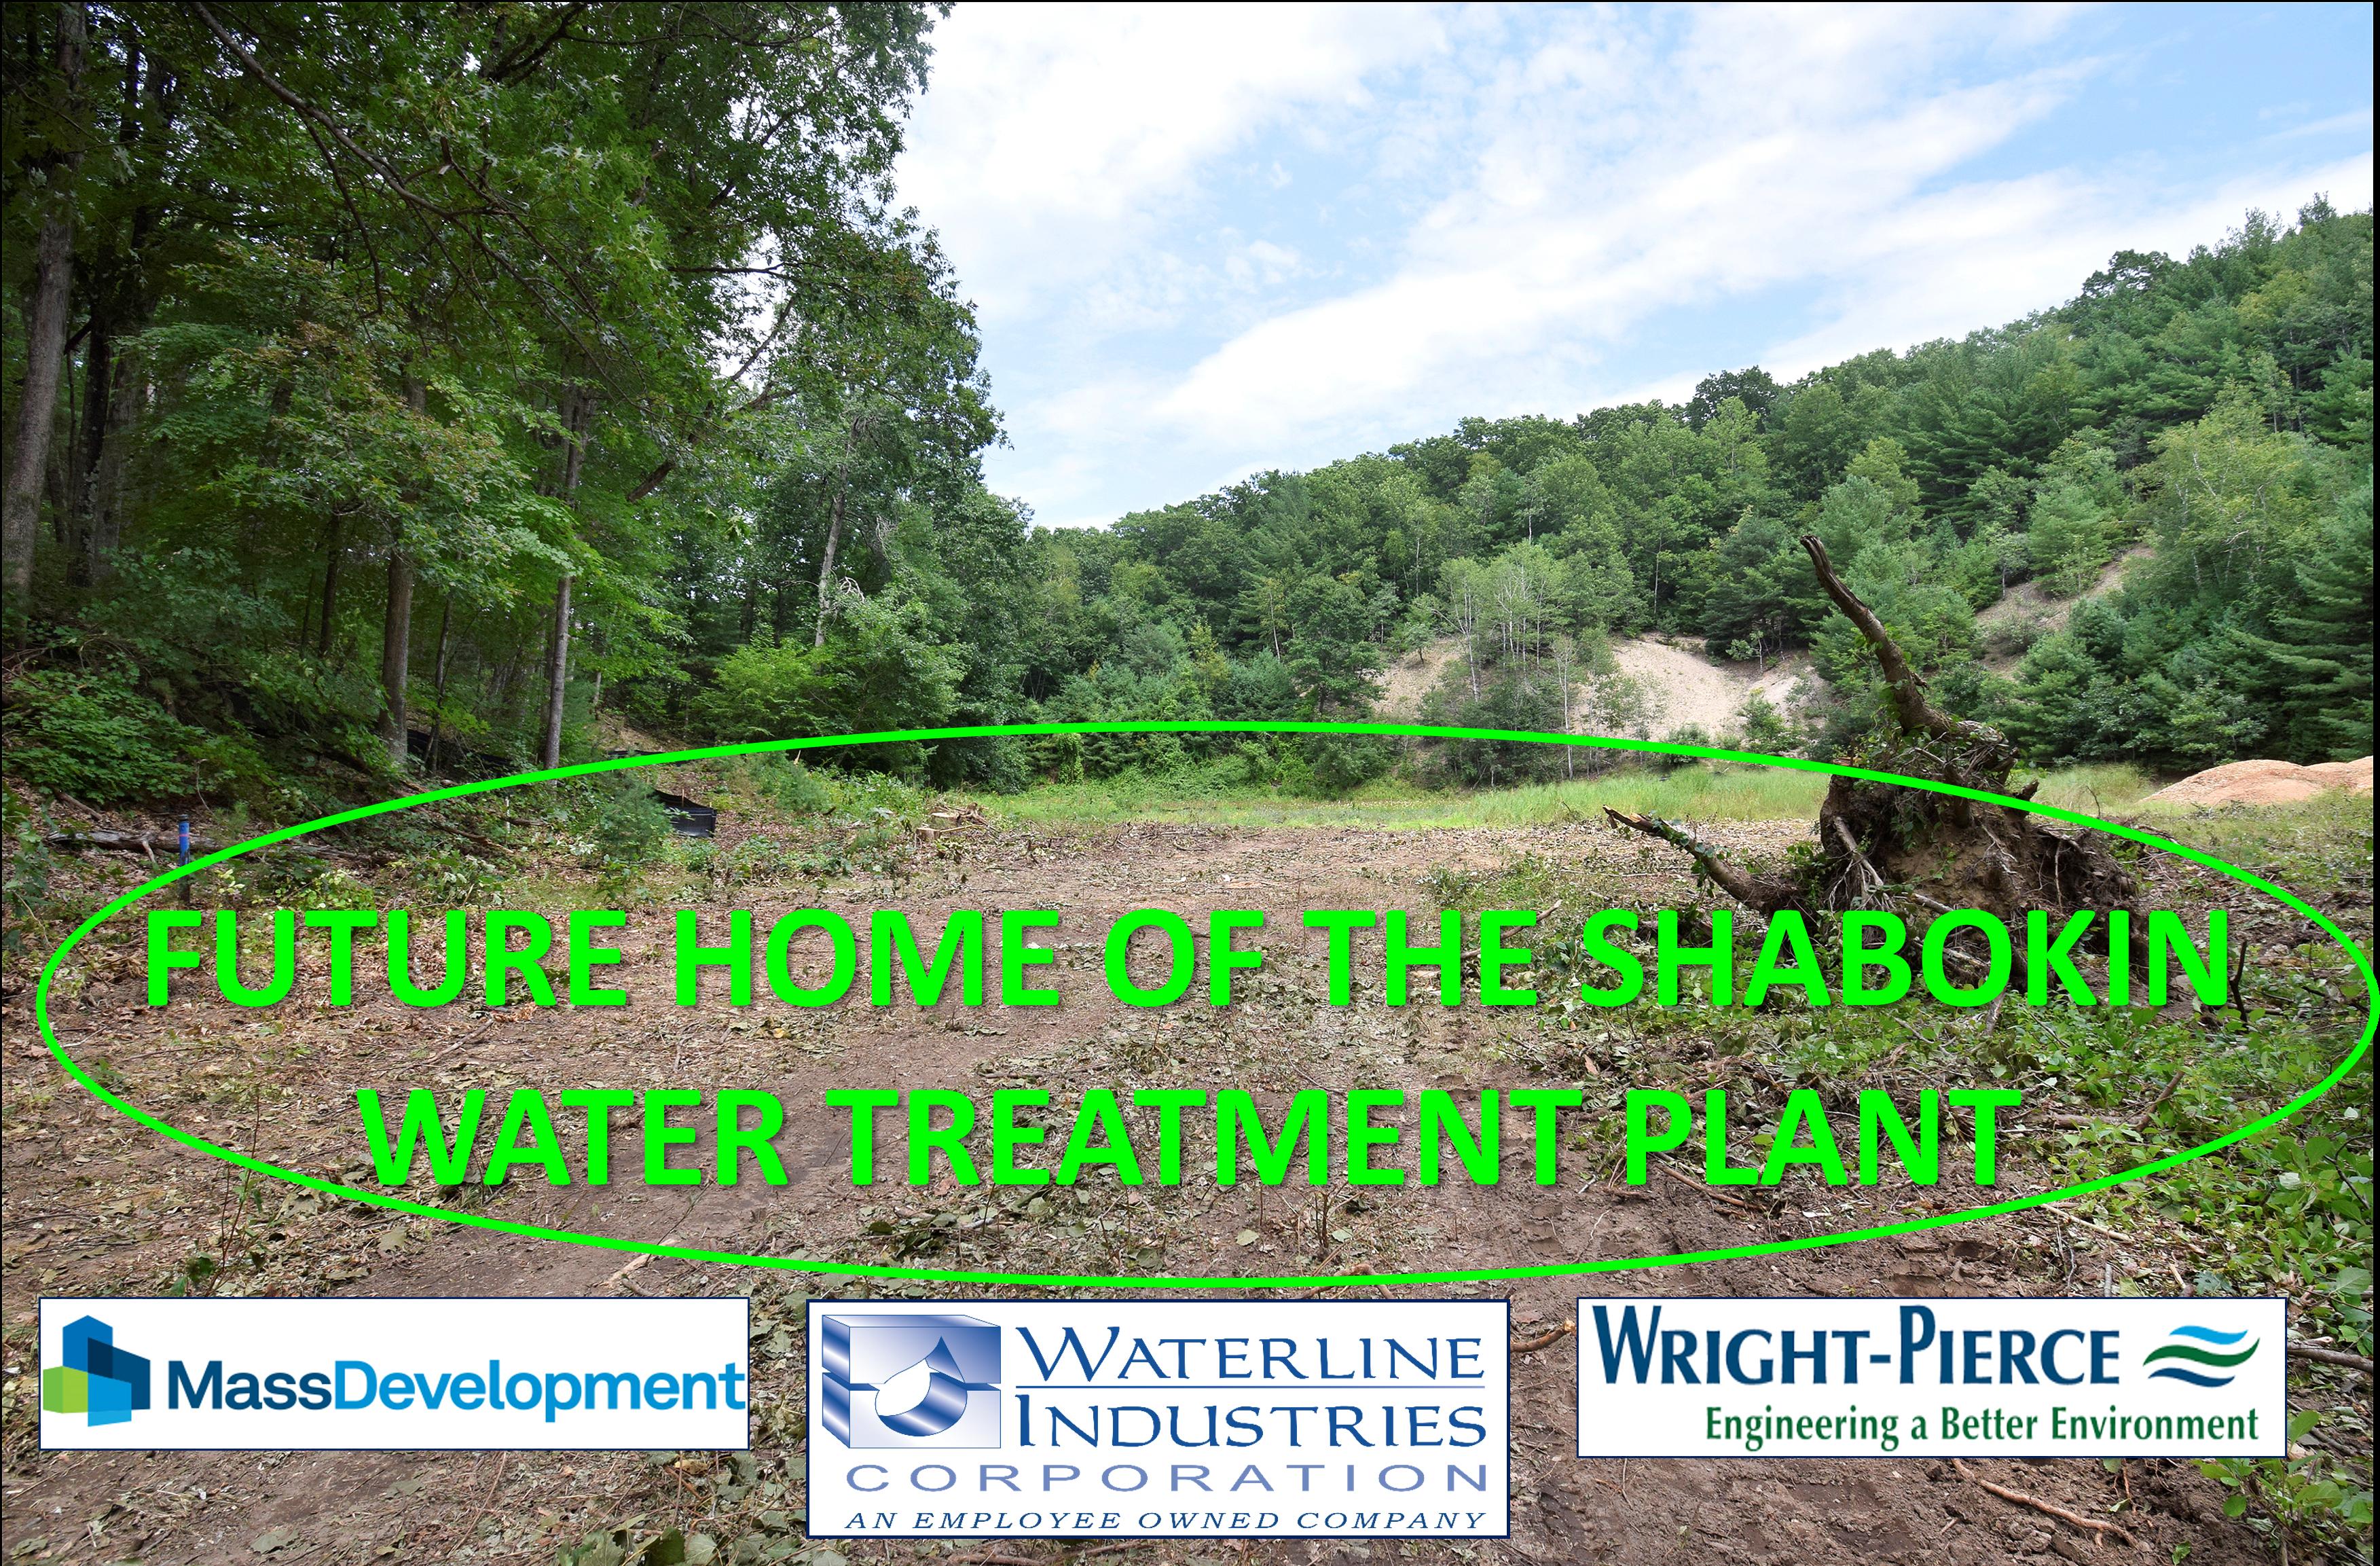 I2106-SHABOKIN WTP (FUTURE HOME)